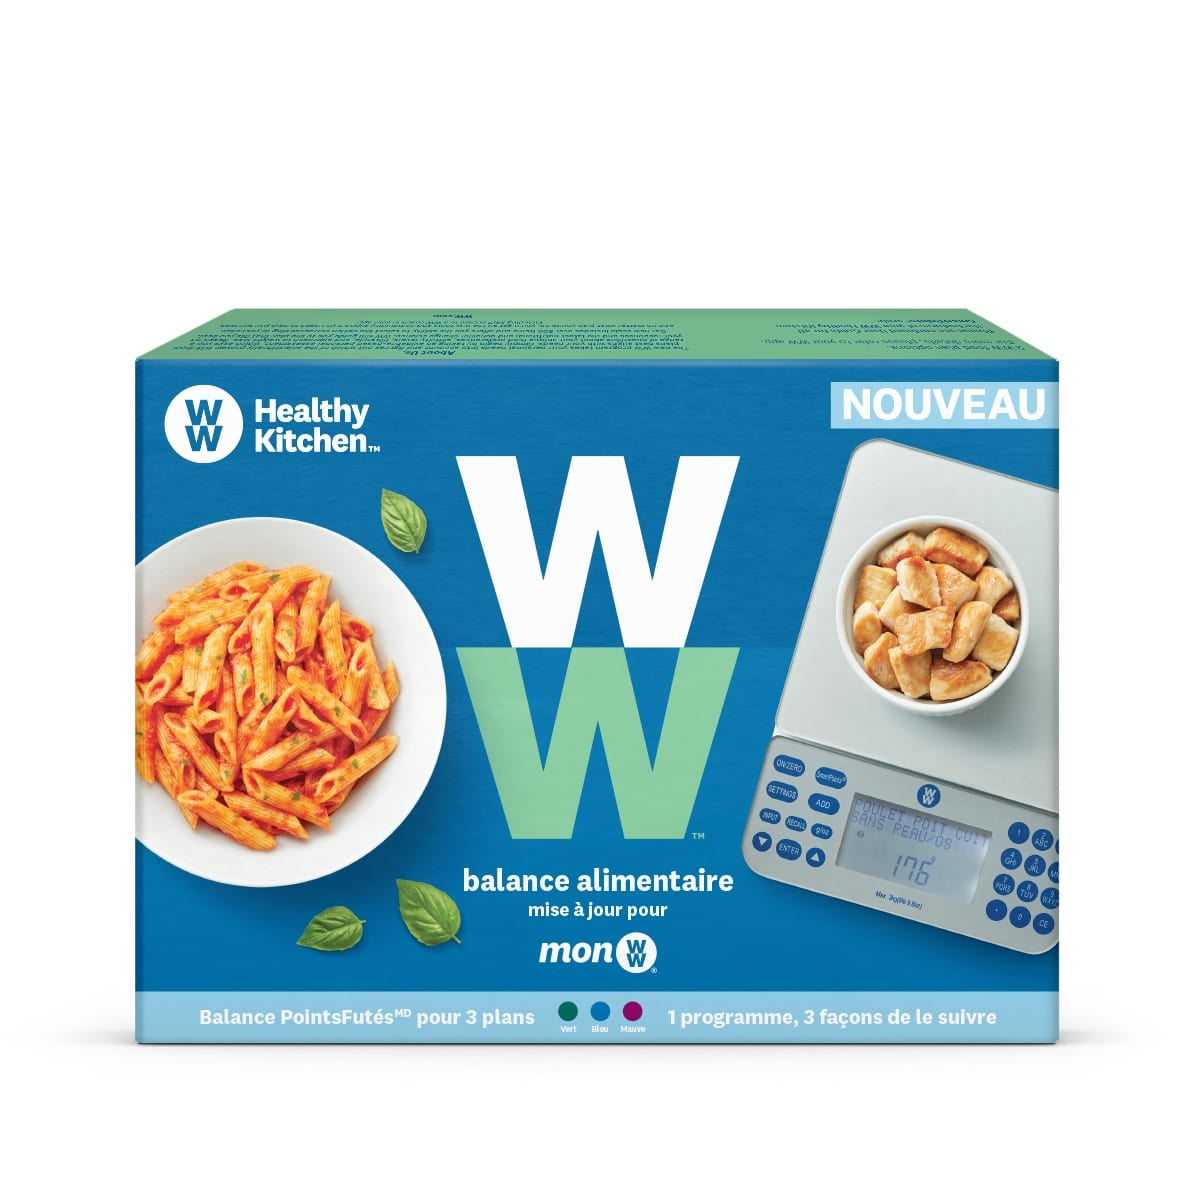 myWW food scale box back